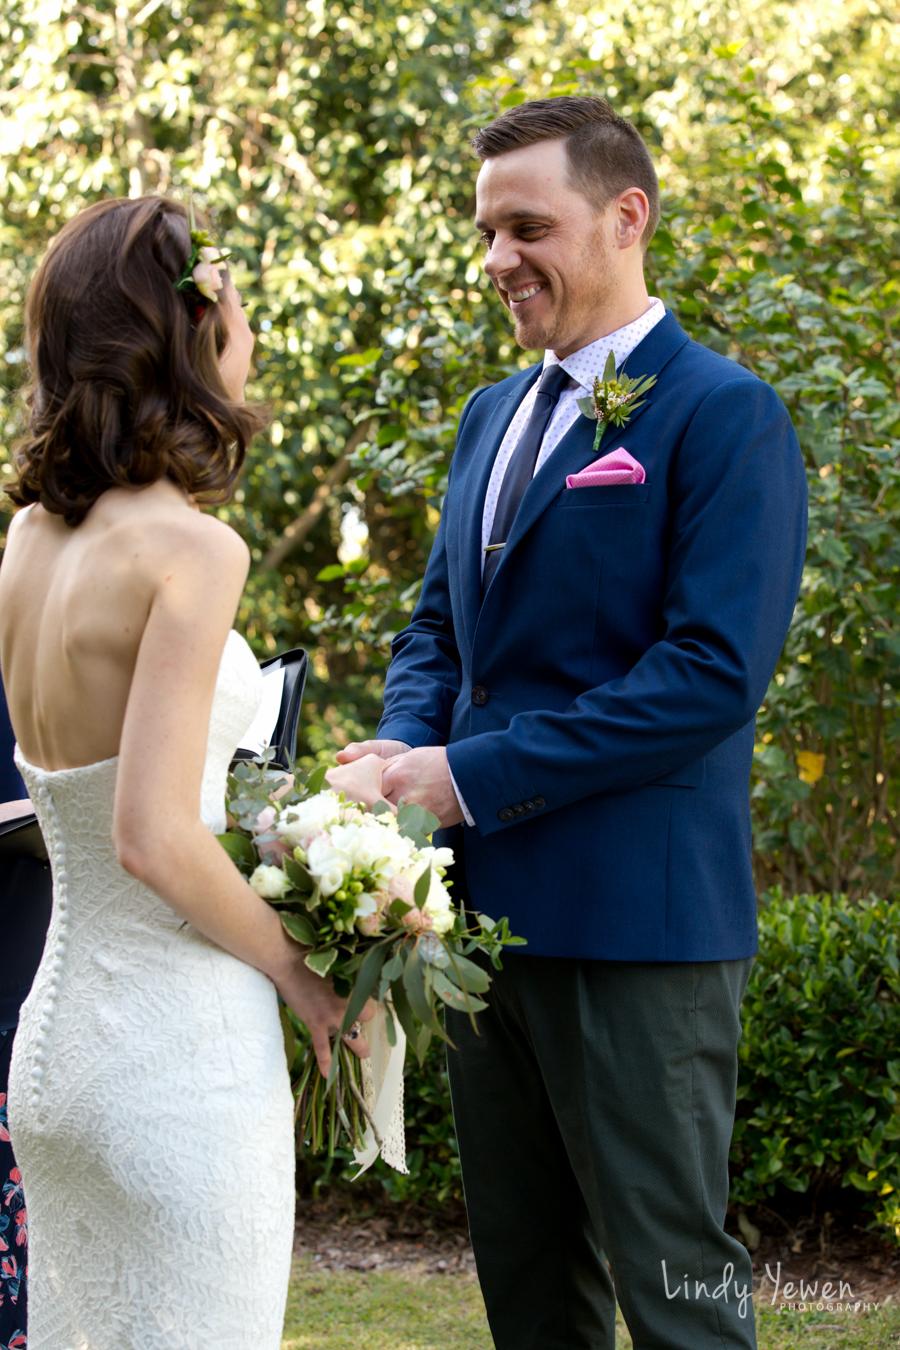 Montville-wedding-photographer-Lauren-Kirby 92.jpg